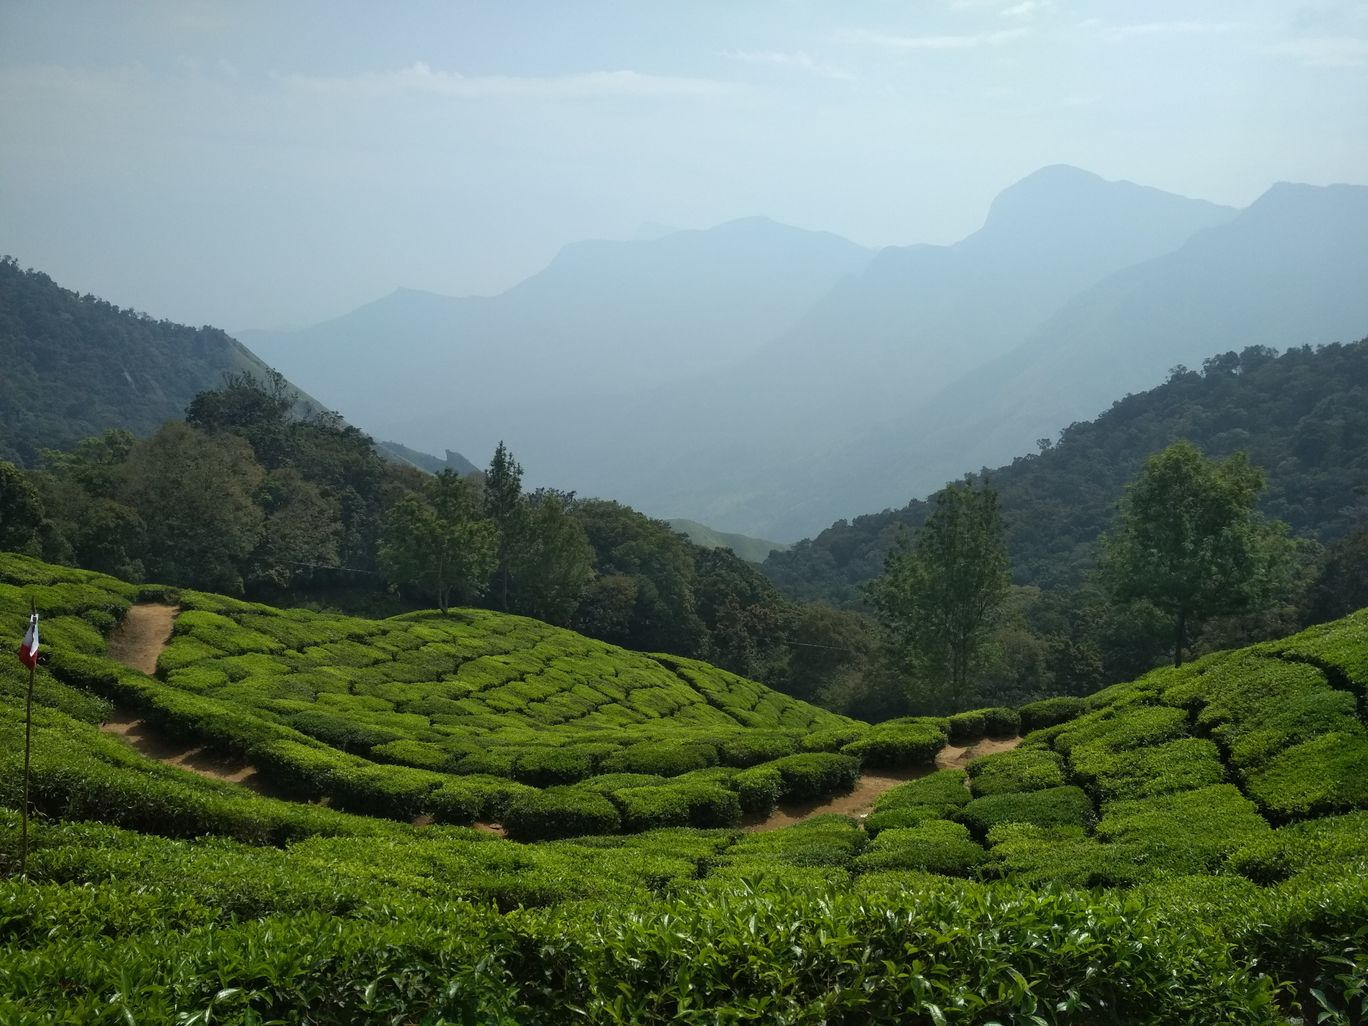 Photo of Tea Garden Munnar Food Grains By Sakshi Sharma